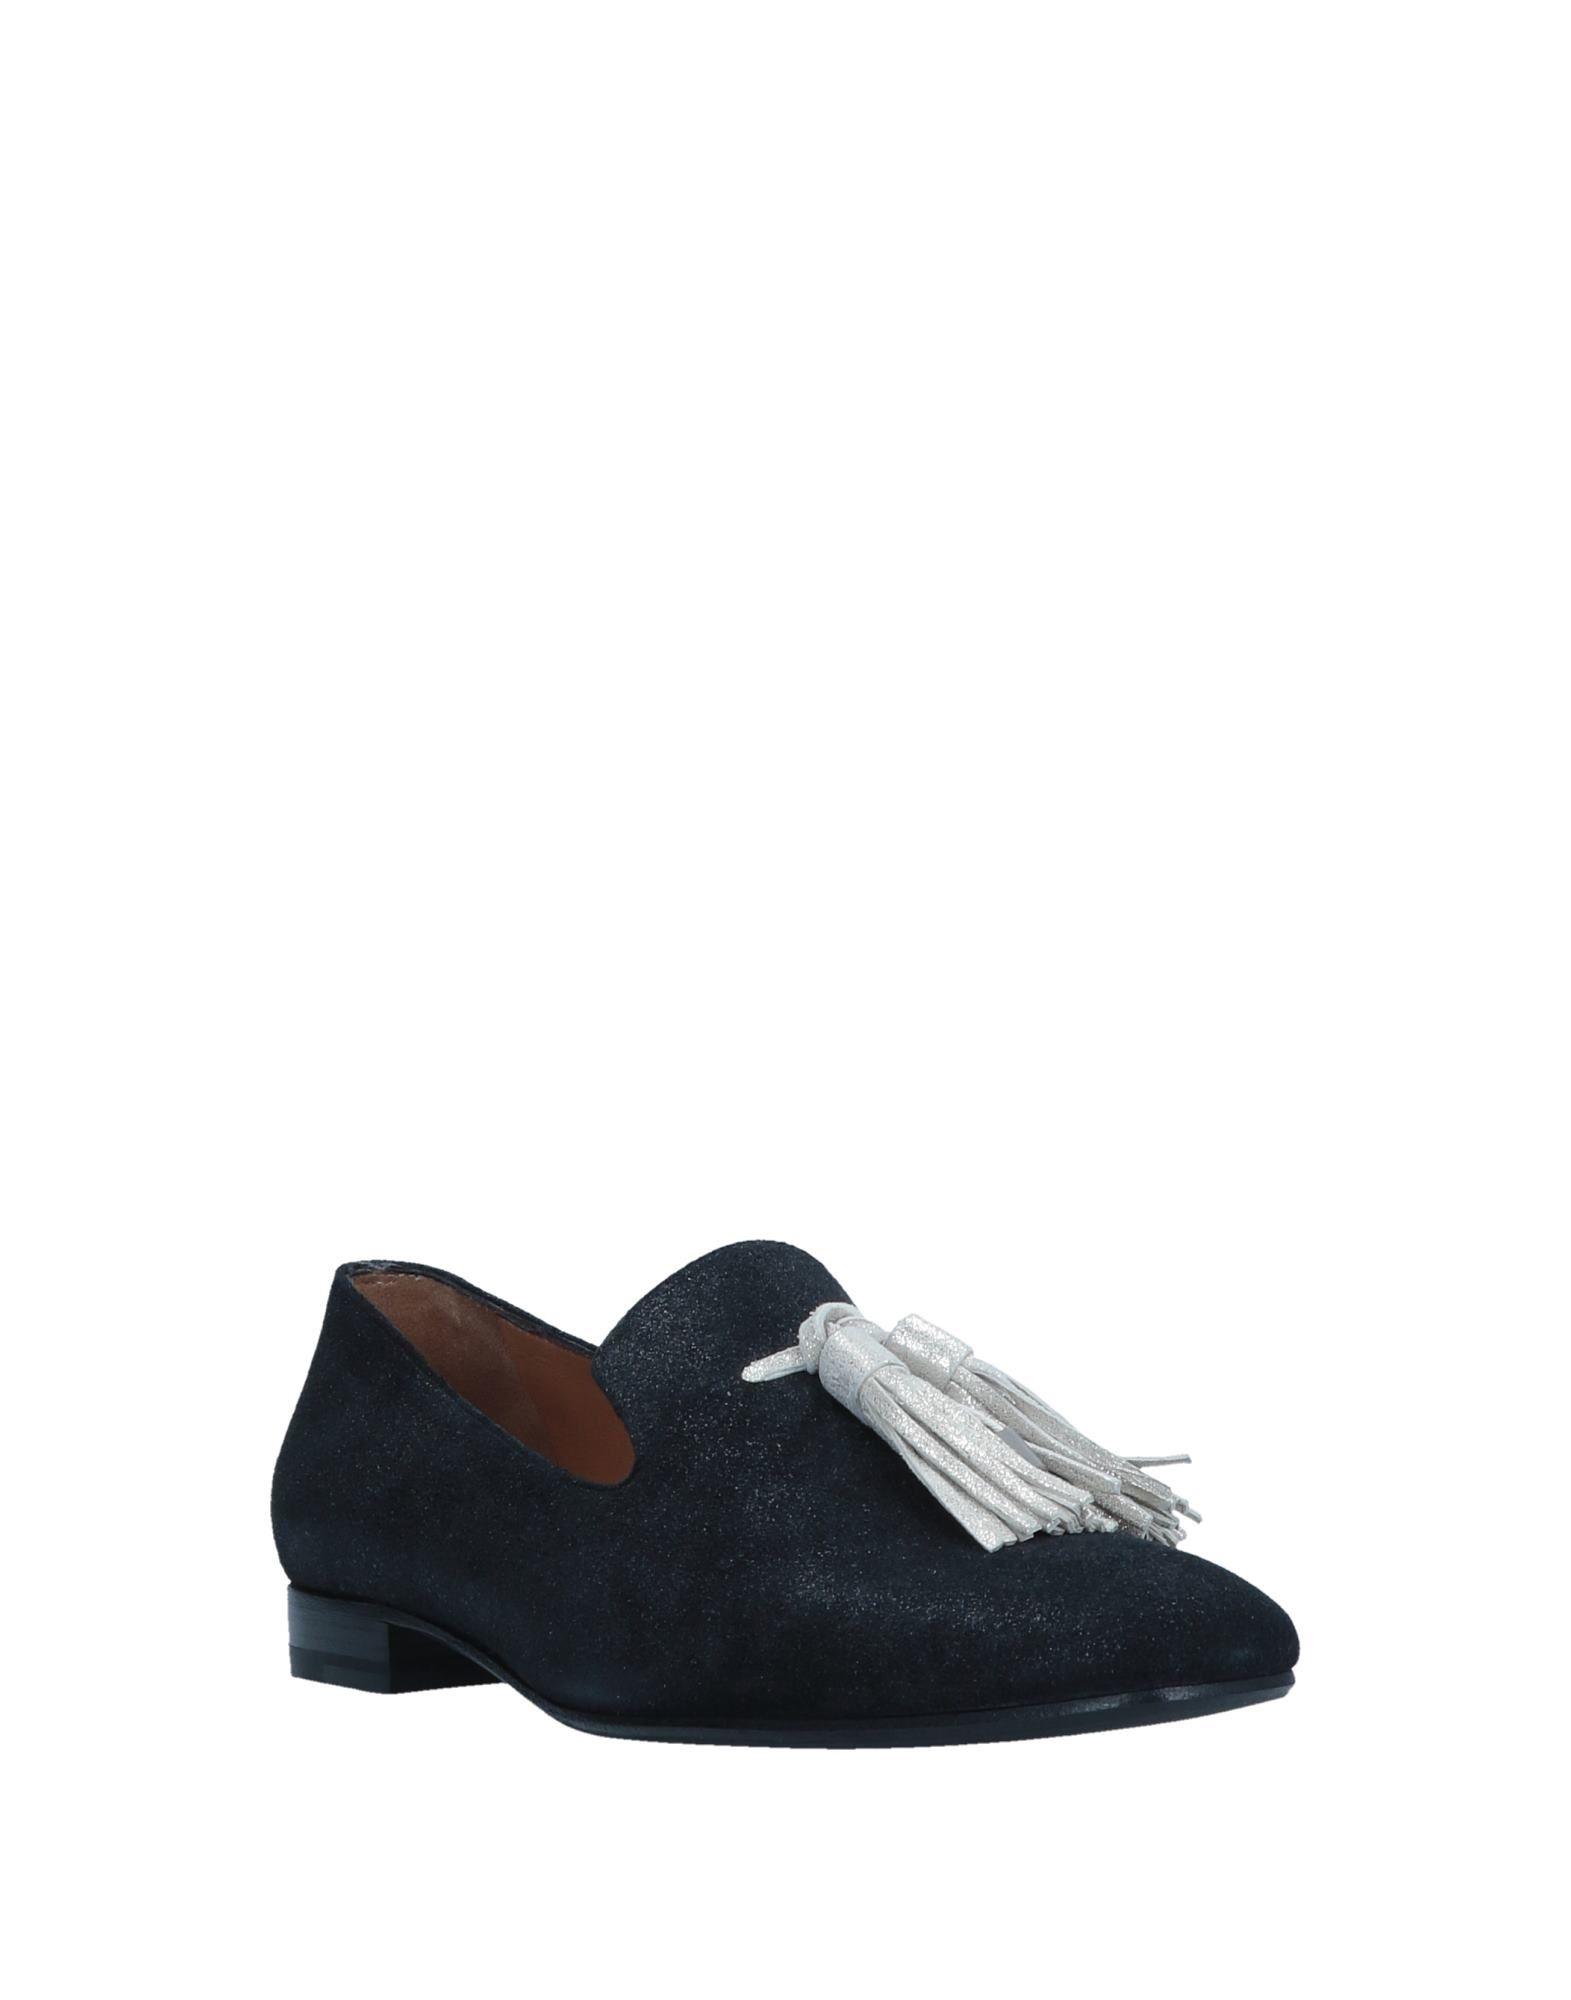 Rabatt Damen Schuhe Fratelli Rossetti Mokassins Damen Rabatt  11550262LM 23cd96